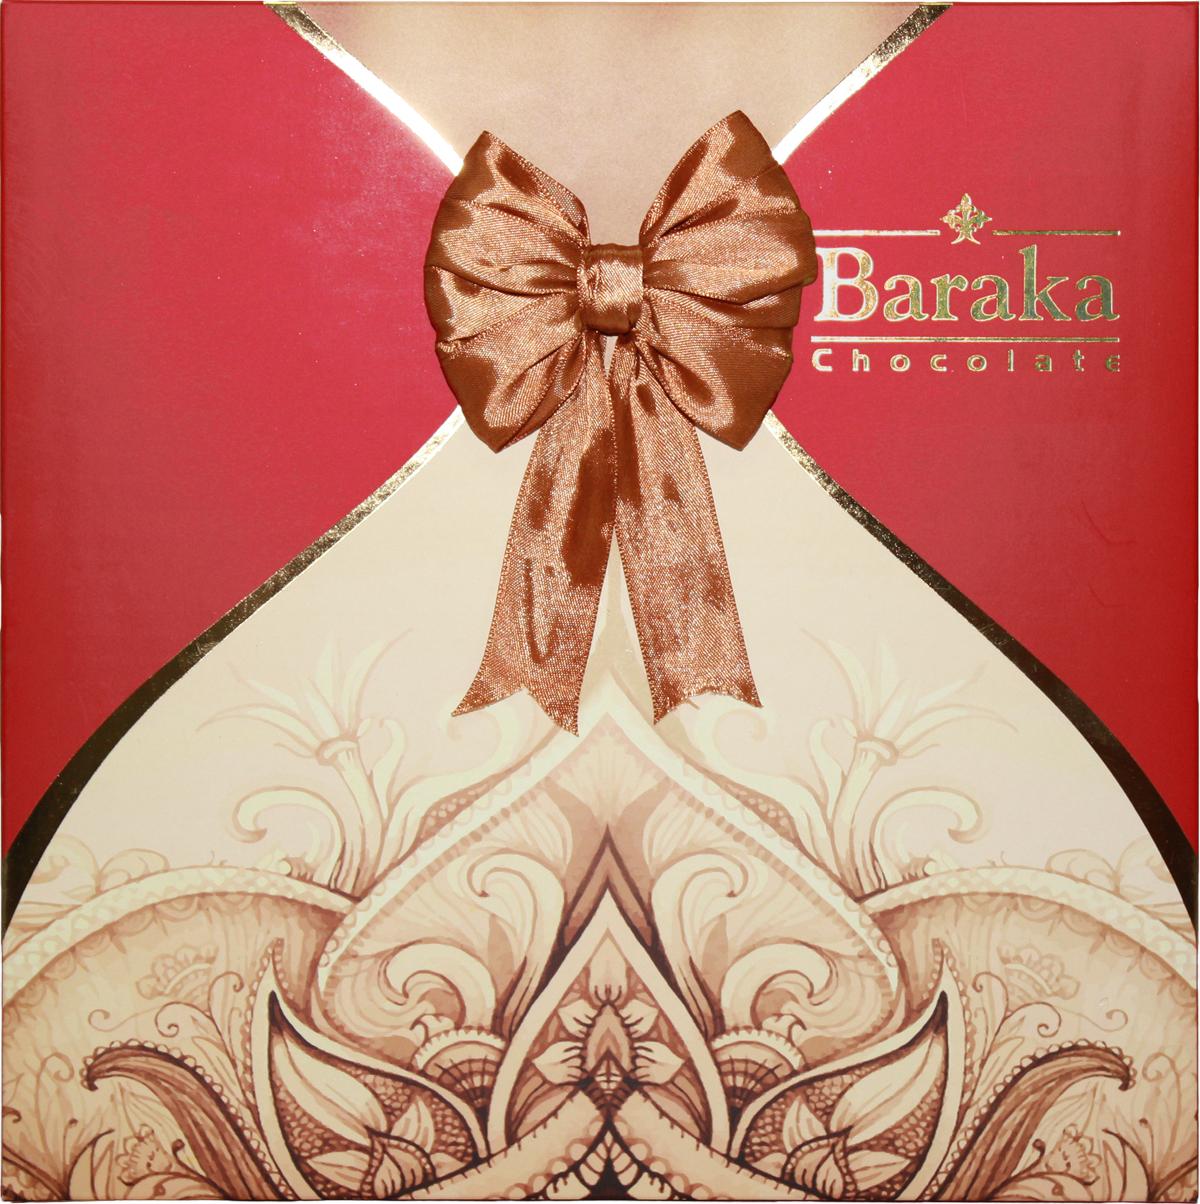 Baraka Бану ассорти шоколадных конфет, 240 г galaxy gl 4104 burgundy машинка для стрижки